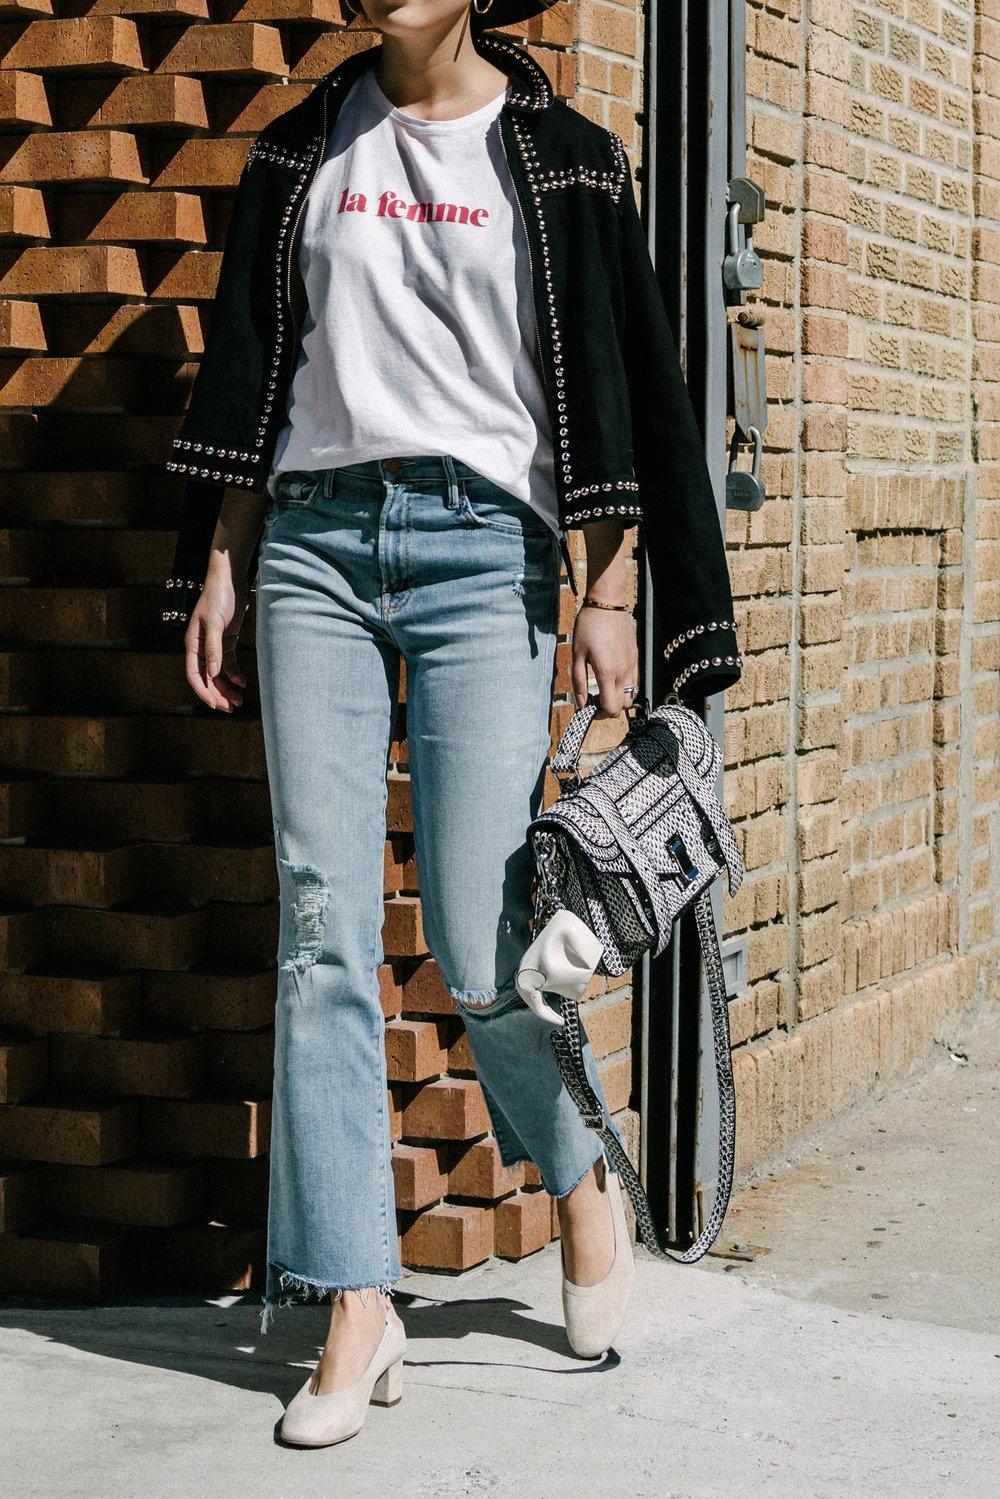 Sézane Jacket  and  Shirt ,  Mother Denim ,  Everlane Shoes , Proenza Schouler Bag,  Loewe Keychain